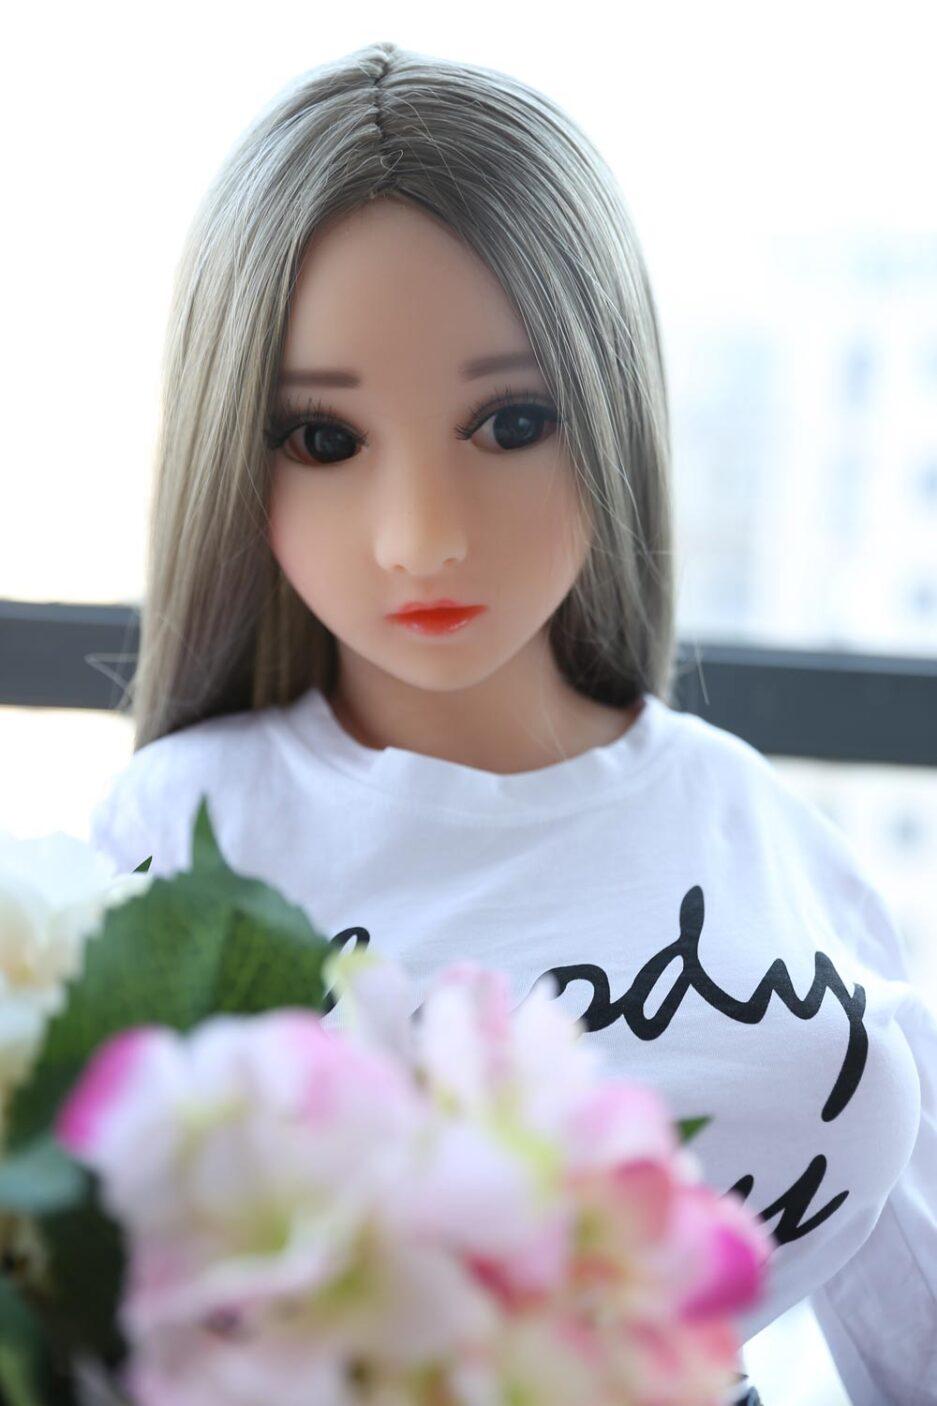 Mini sex doll with big eyes